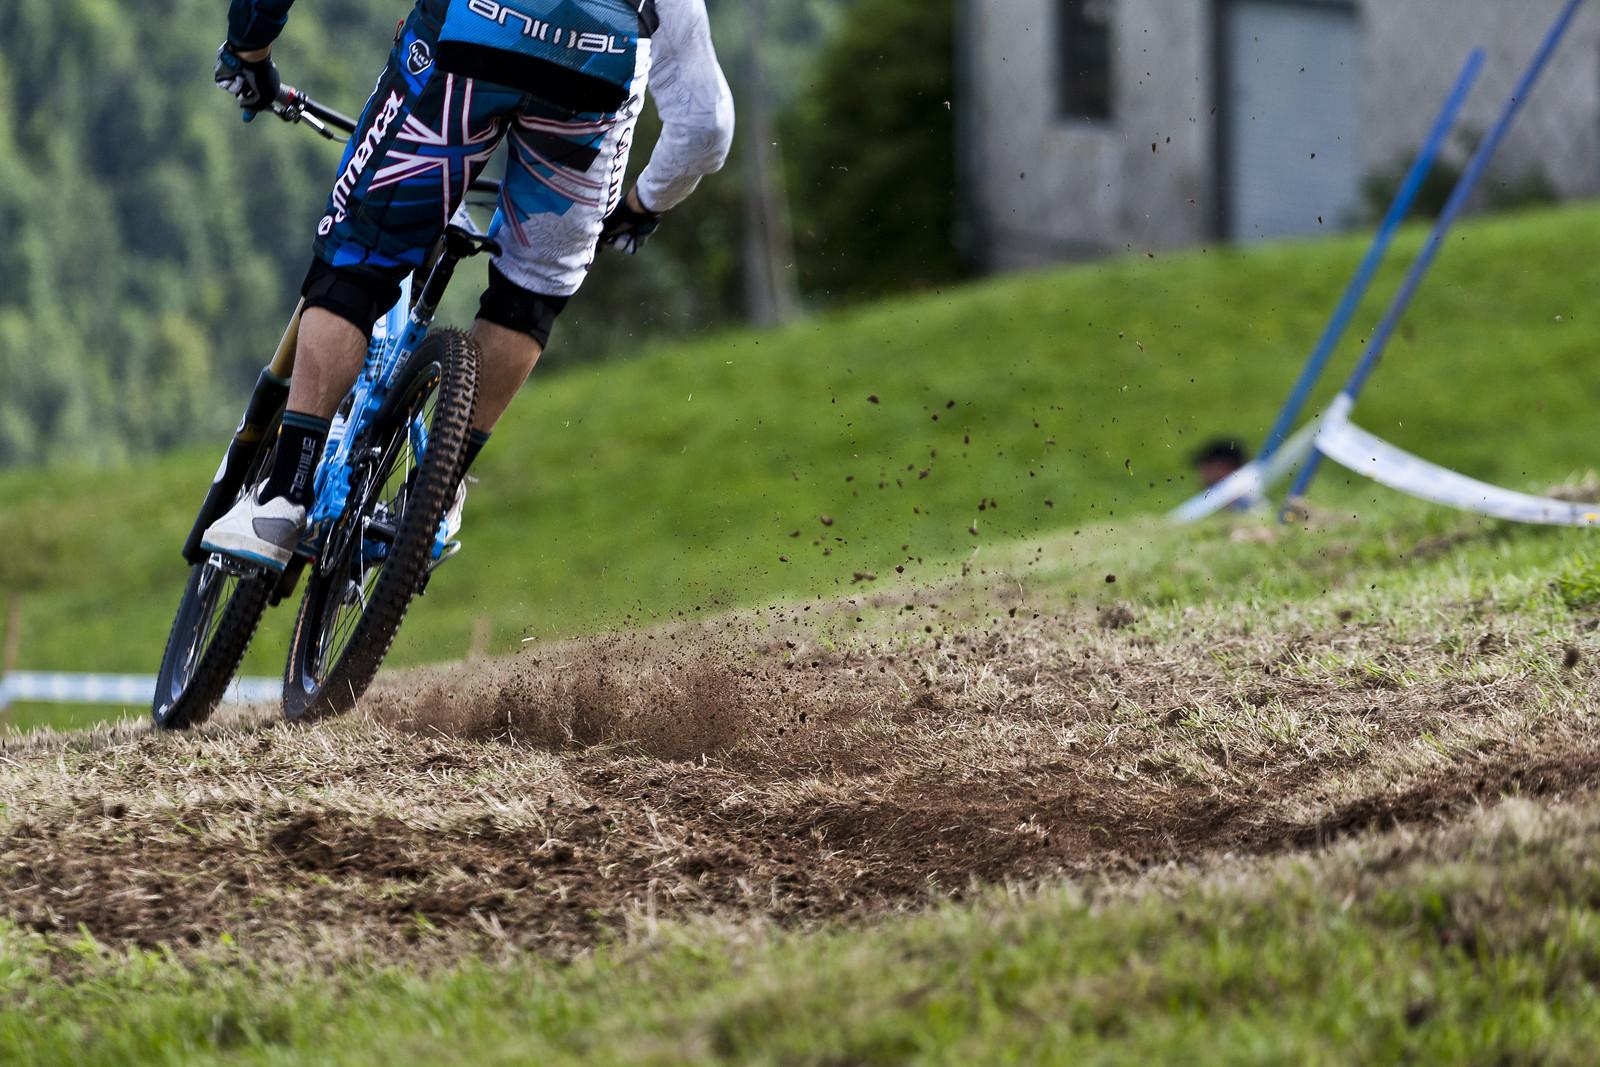 La Bresse - quasibinaer - Mountain Biking Pictures - Vital MTB